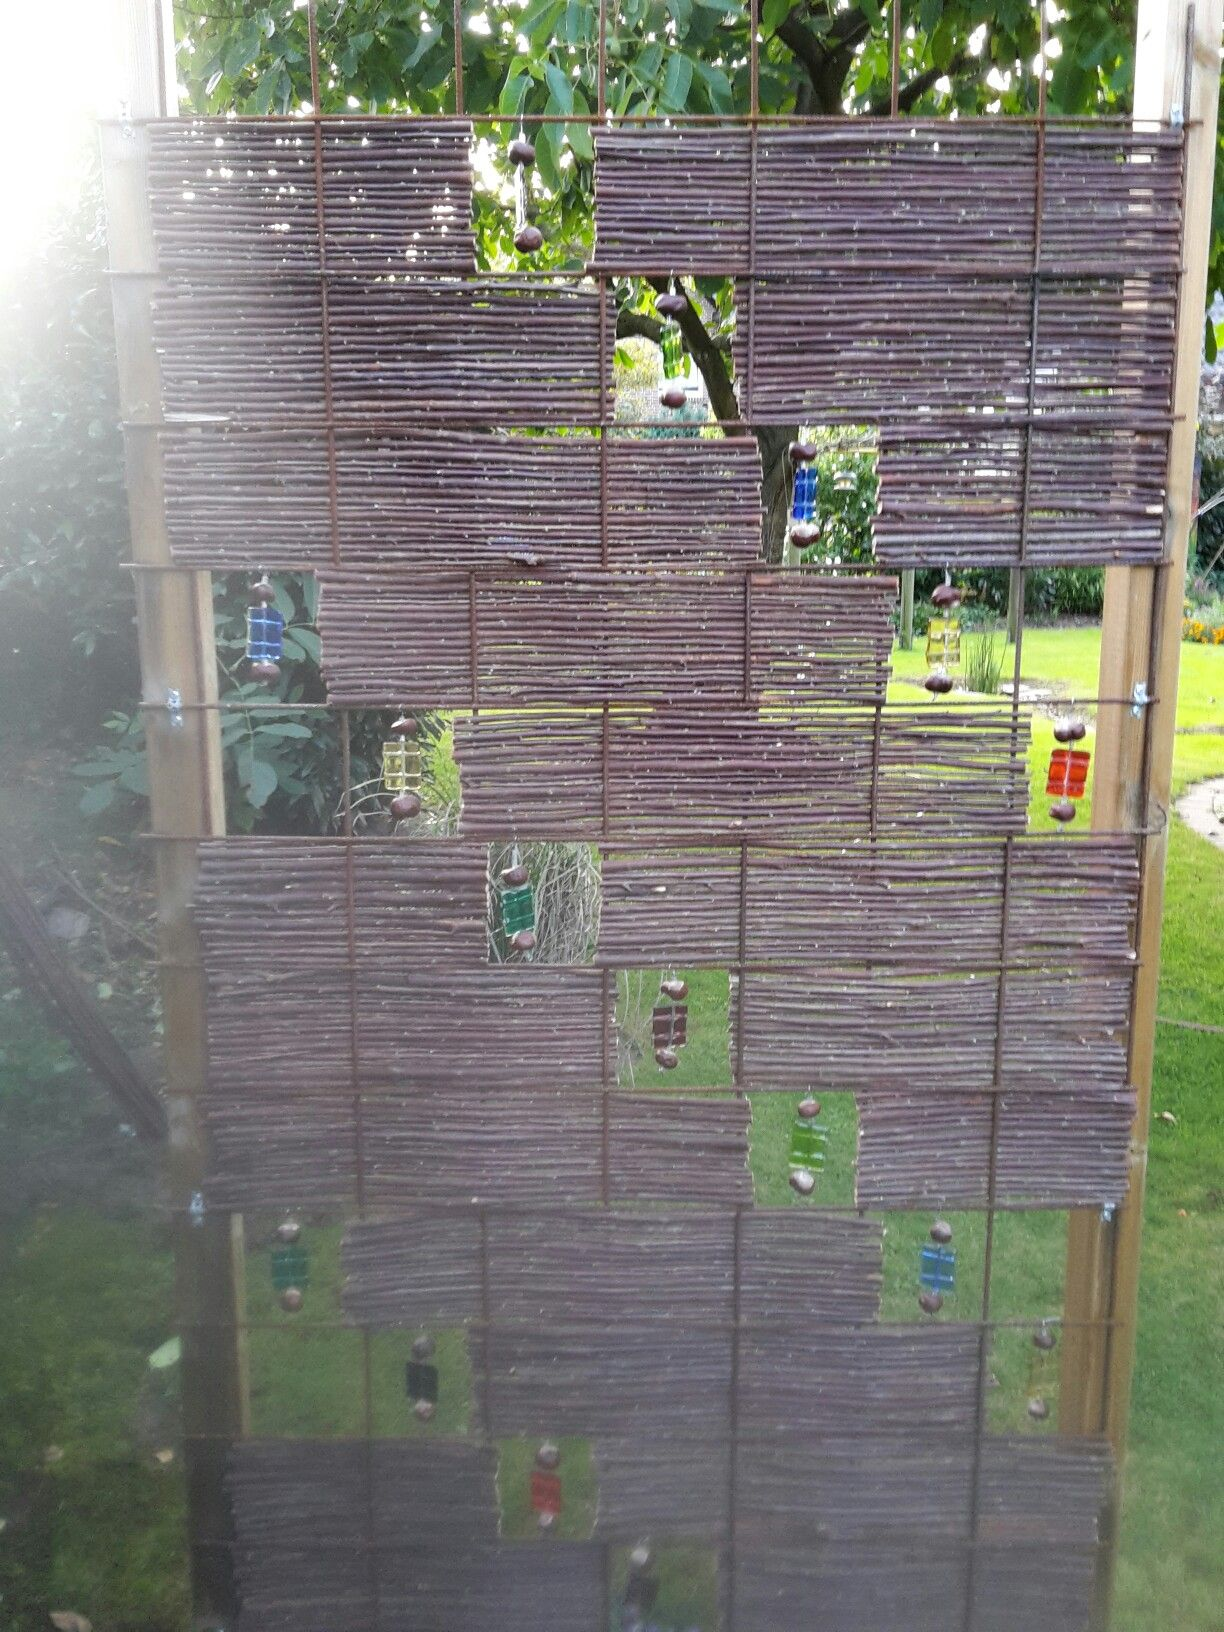 Zaunelement aus baustahlmatte weidenrute und glasdeko for Glasdeko garten